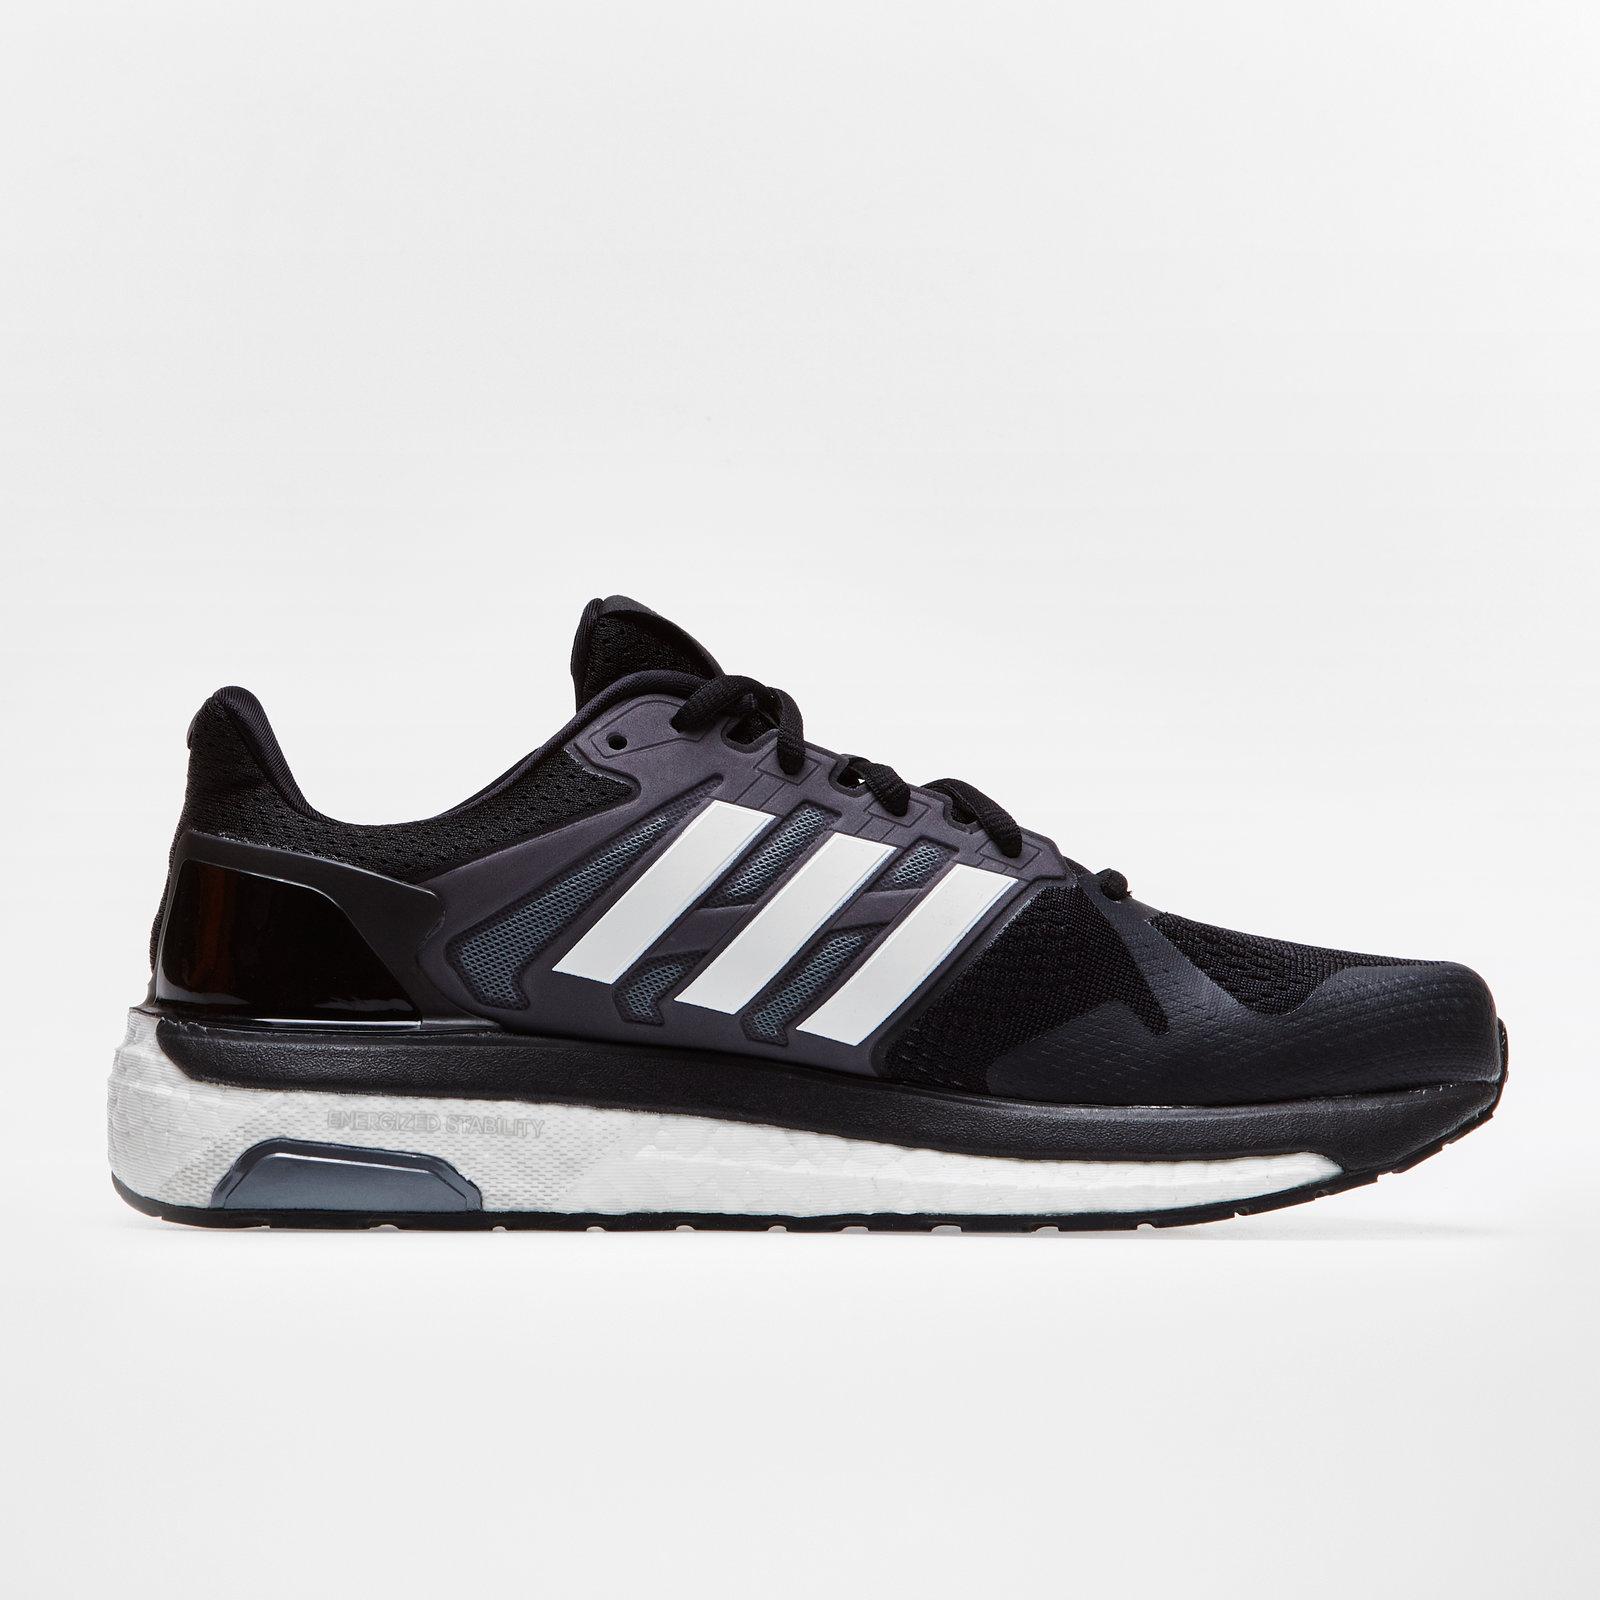 0fad89c7e adidas Mens Supernova ST Running Shoes Jogging Footwear Sports Trainers  Black